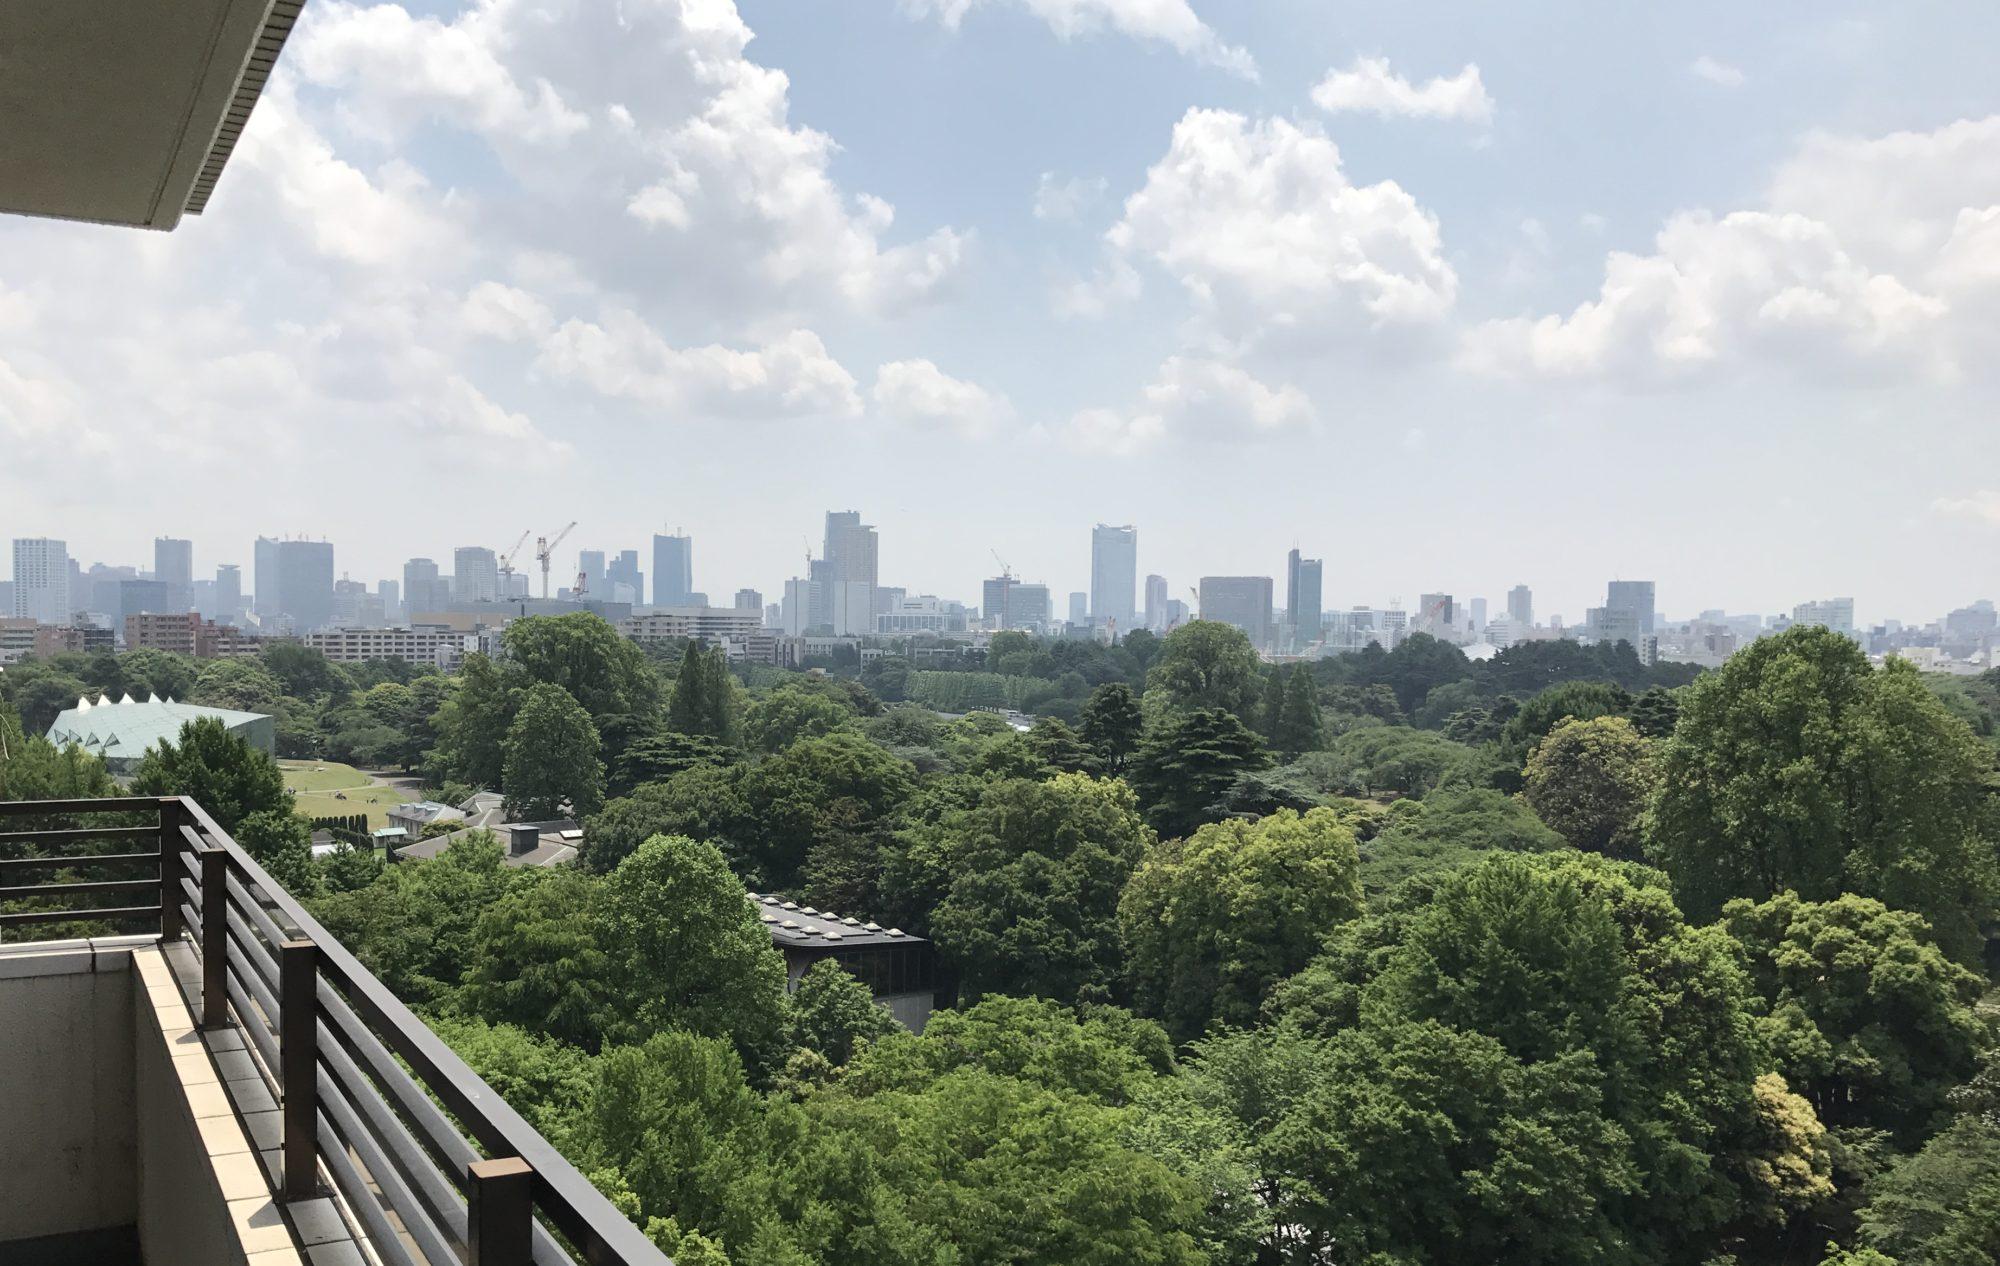 katsukinoboru.jp